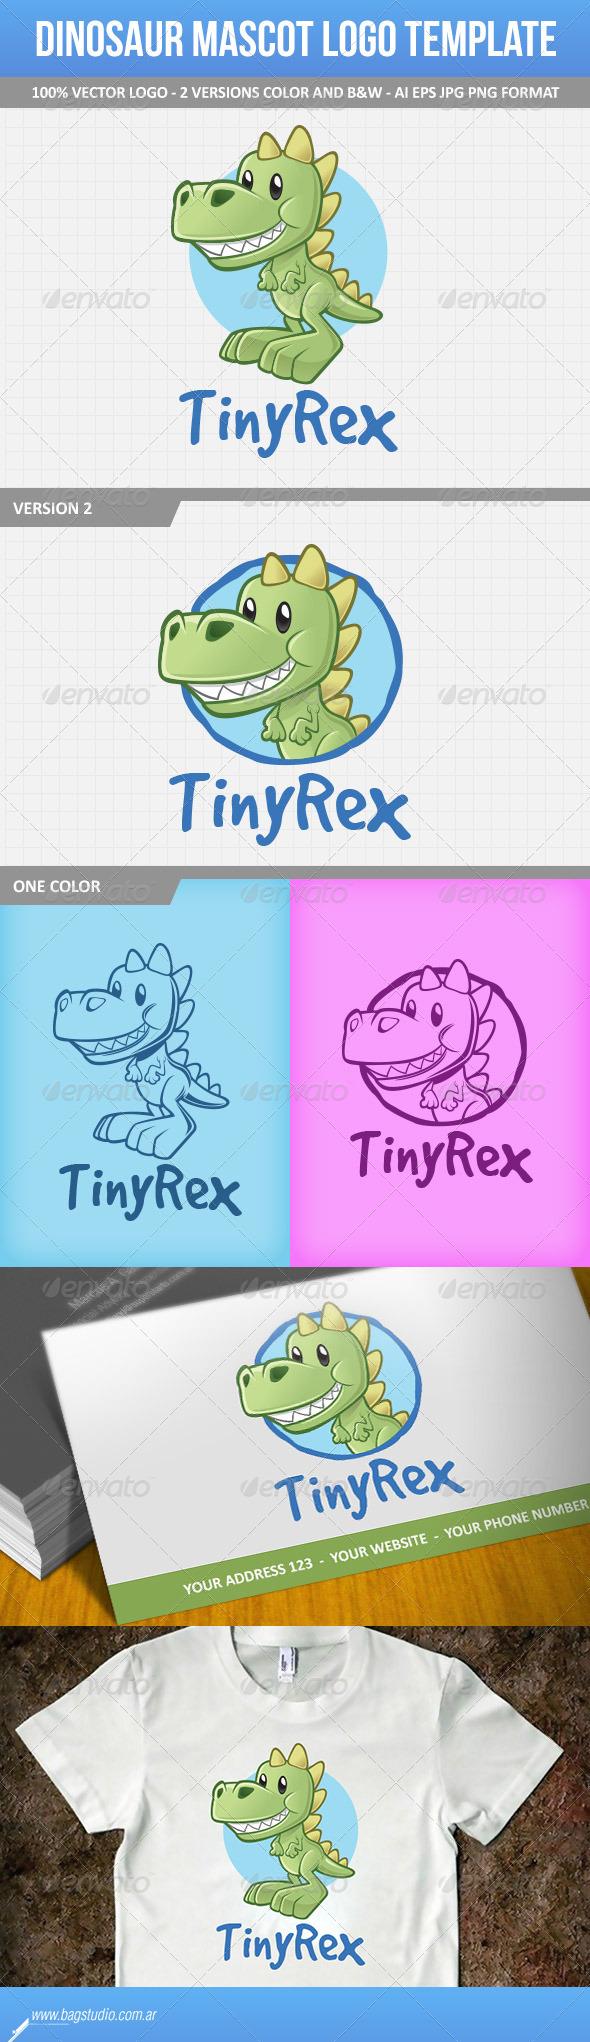 Dinosaur Mascot Logo Template - Animals Logo Templates